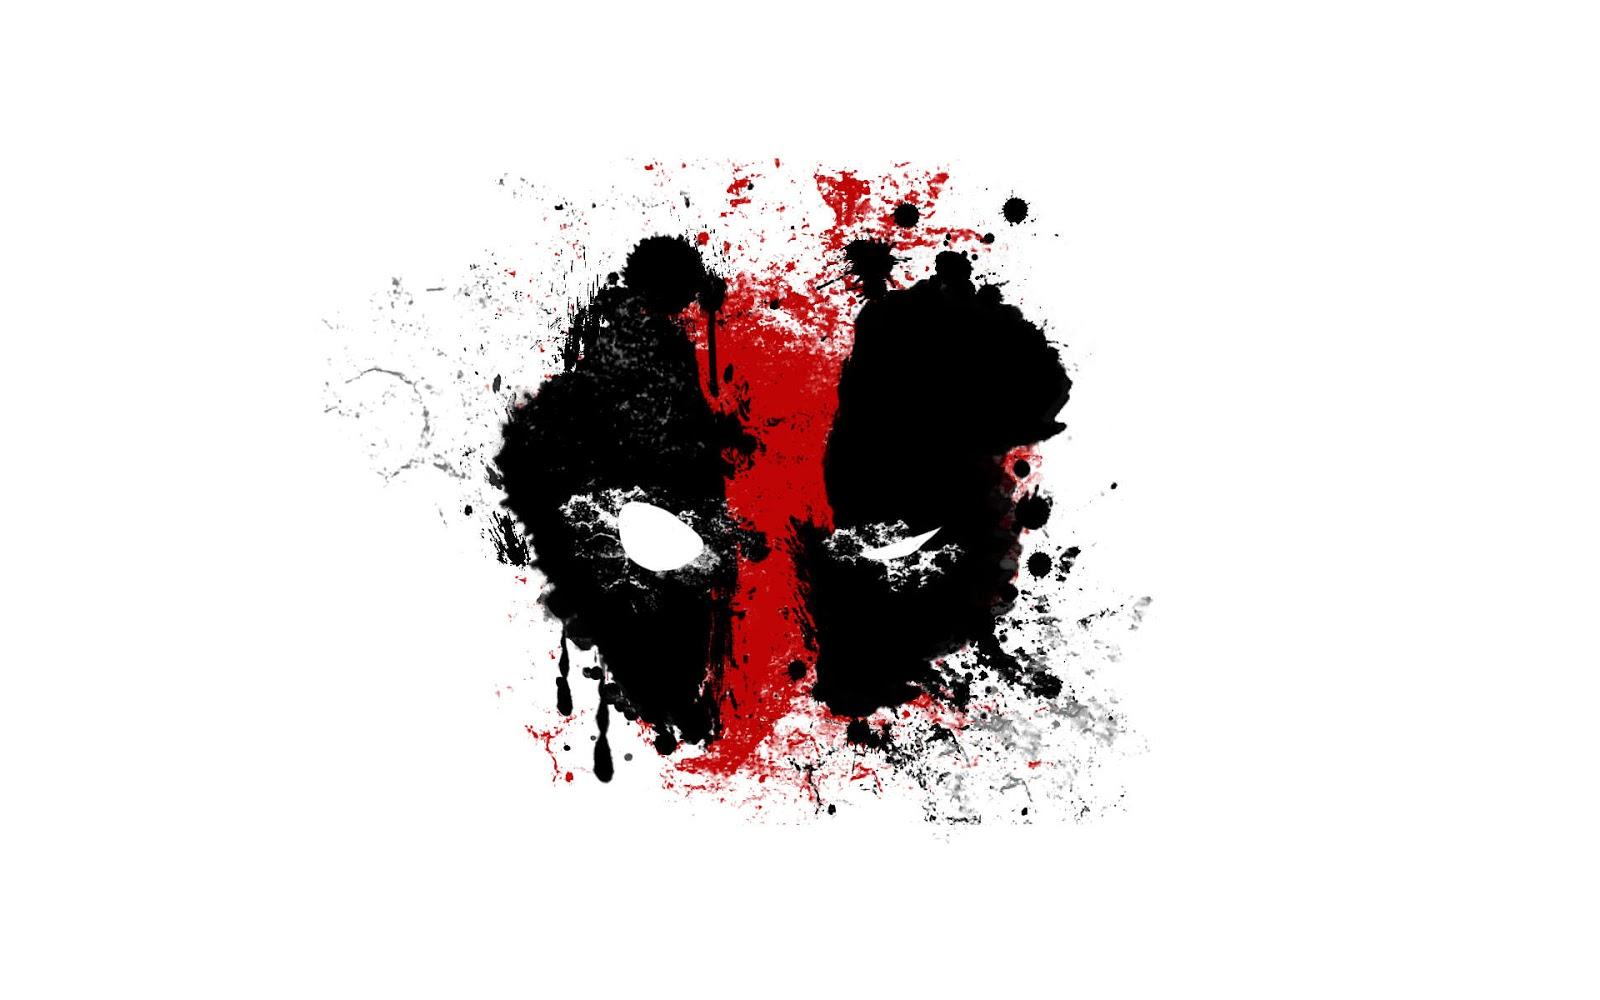 Deadpool Logo Comic Marvel Heroes Superhero White Background HD Wallpaper Desktop PC A186